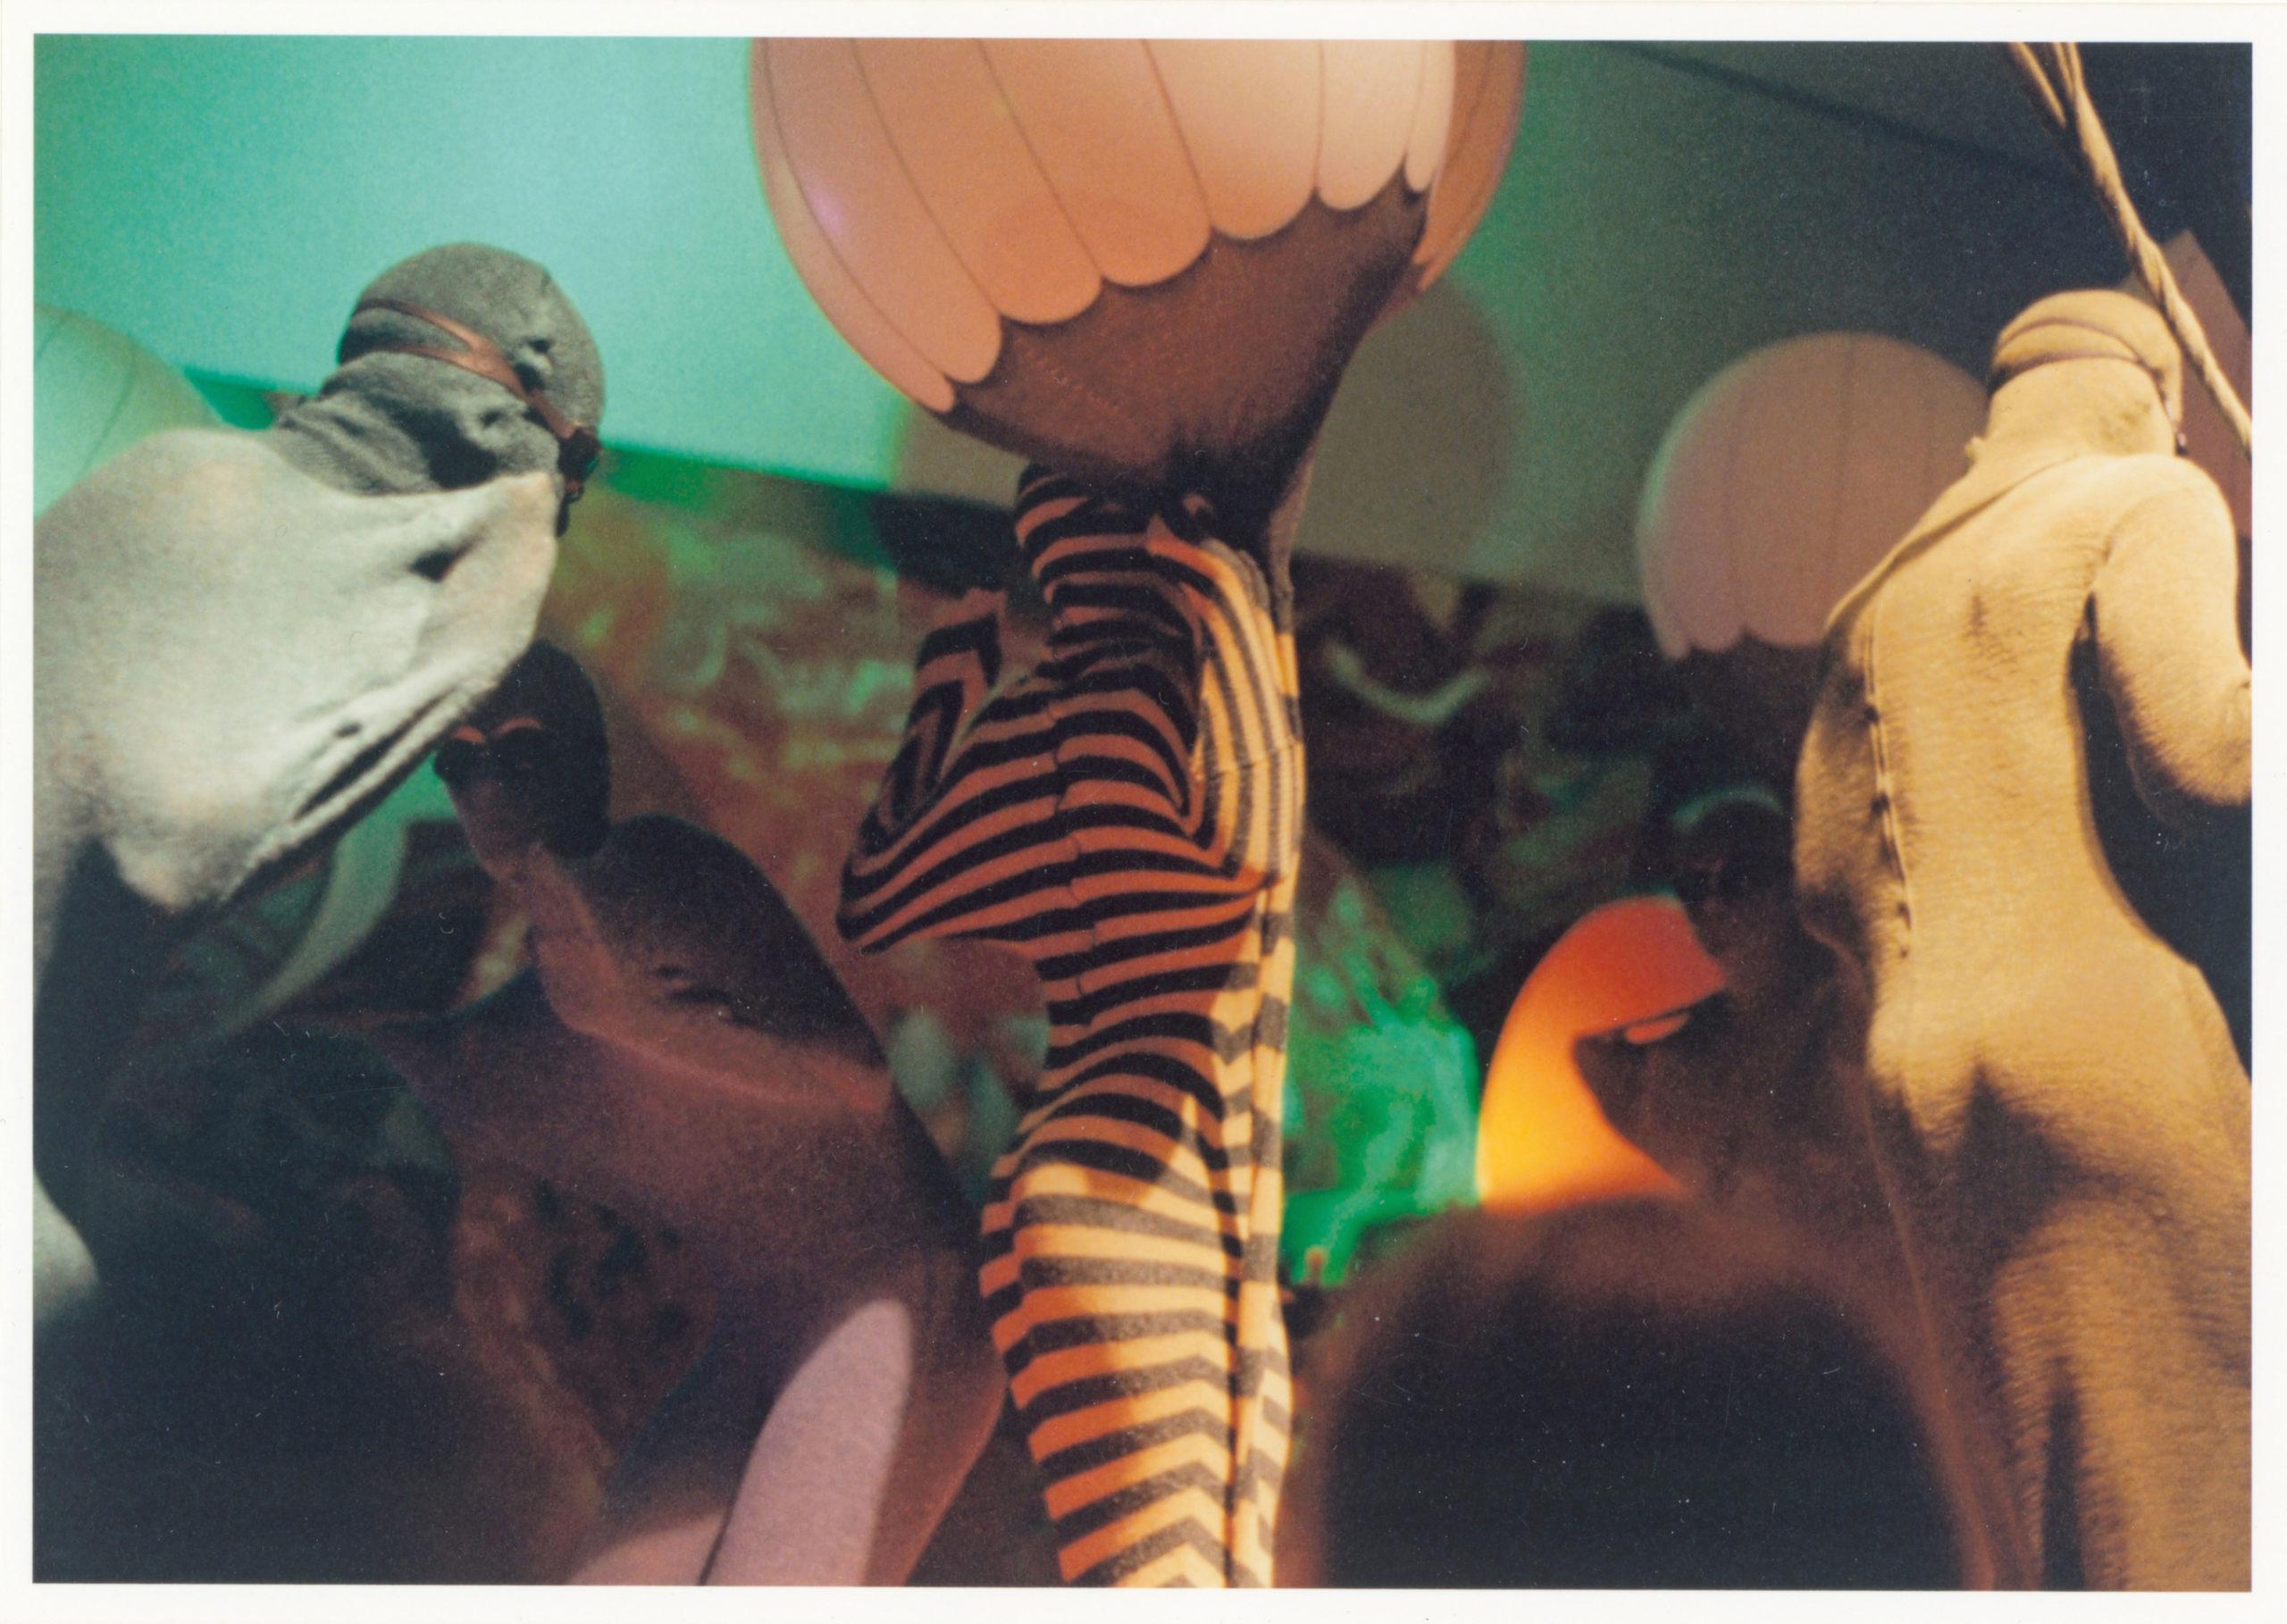 Gertrude Goroncy, Ohne Titel (Deep Diving for Whales, Deutsche Guggenheim), 1997. Foto: Gertrude Goroncy/SMB/Kunstbibliothek/Dietmar Katz